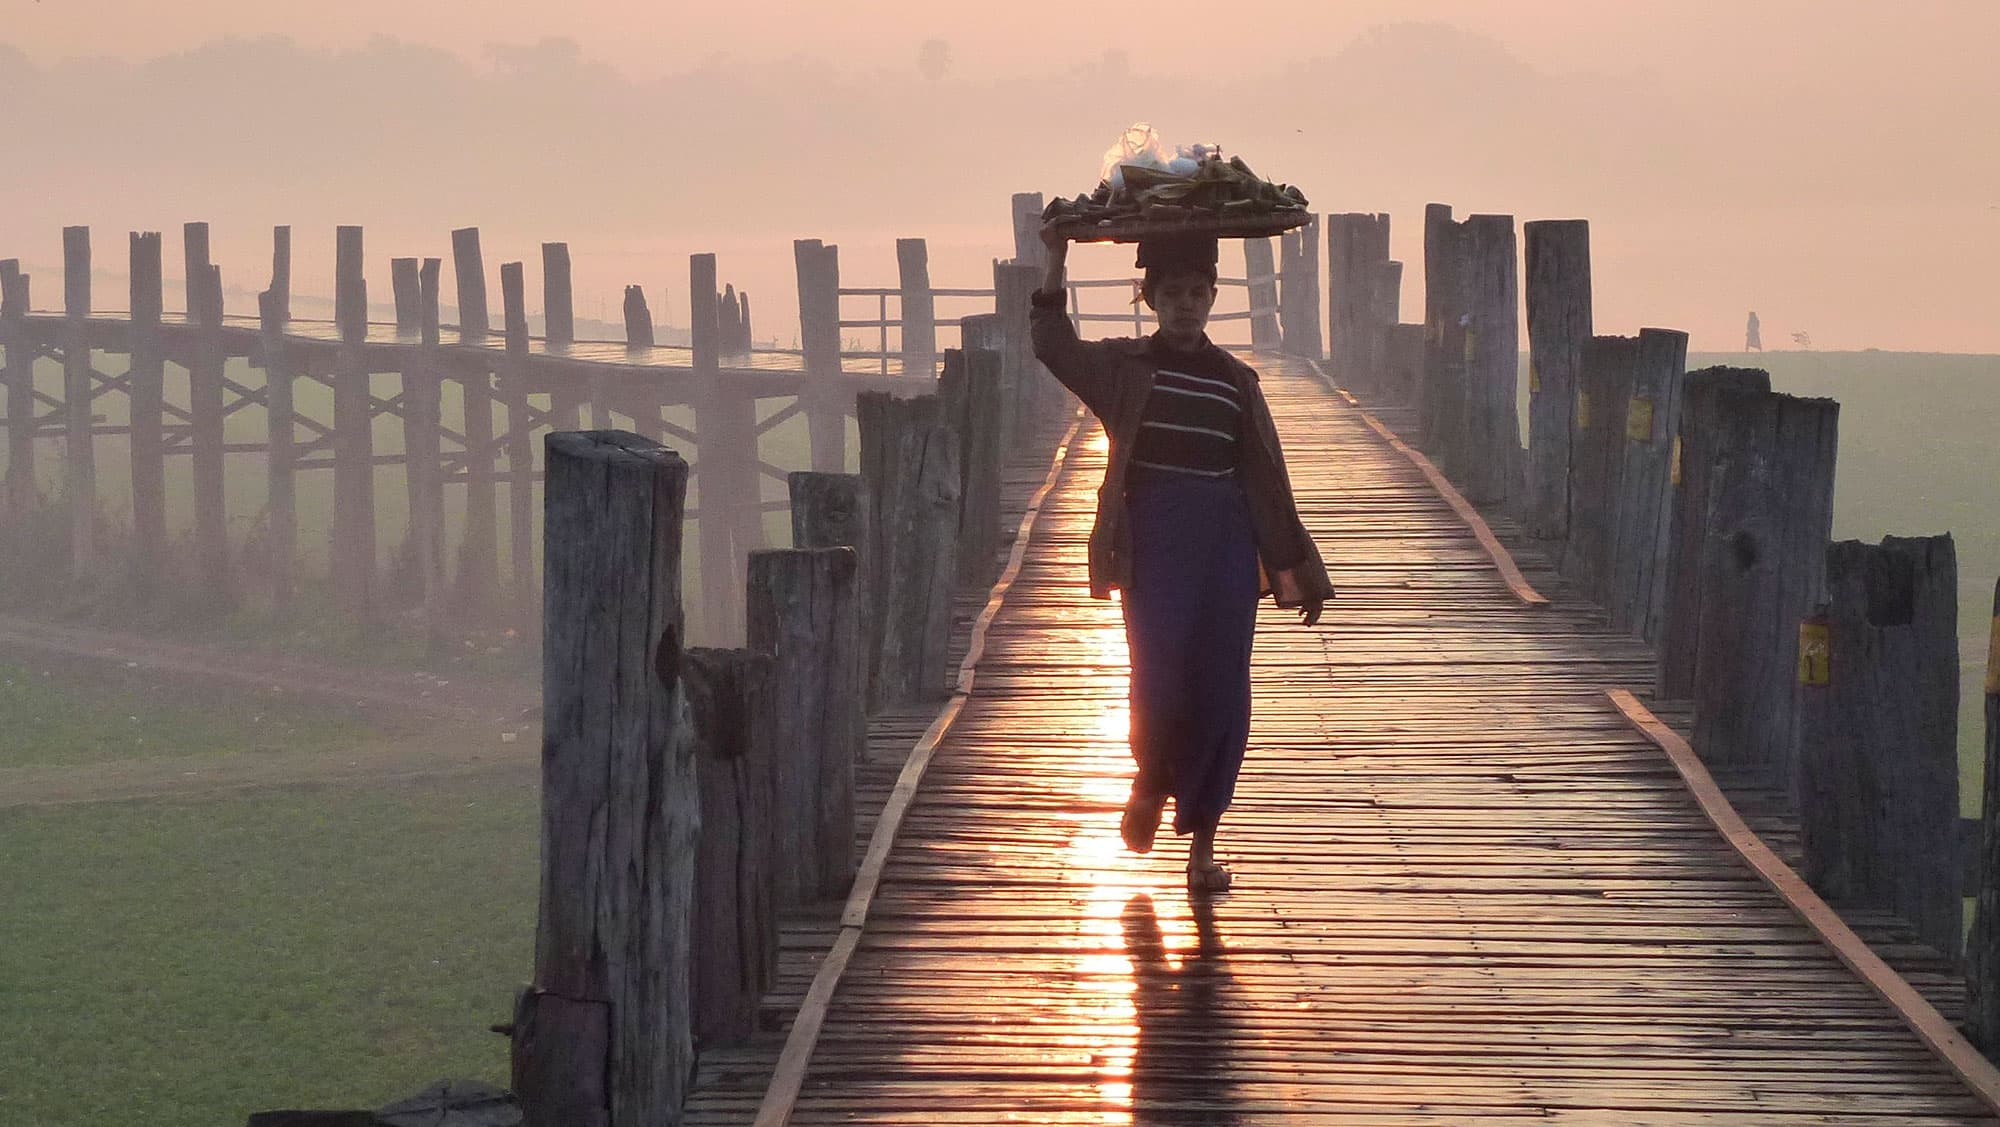 Myanmar espléndido, viaje de lujo - Myanmar- imagen #10